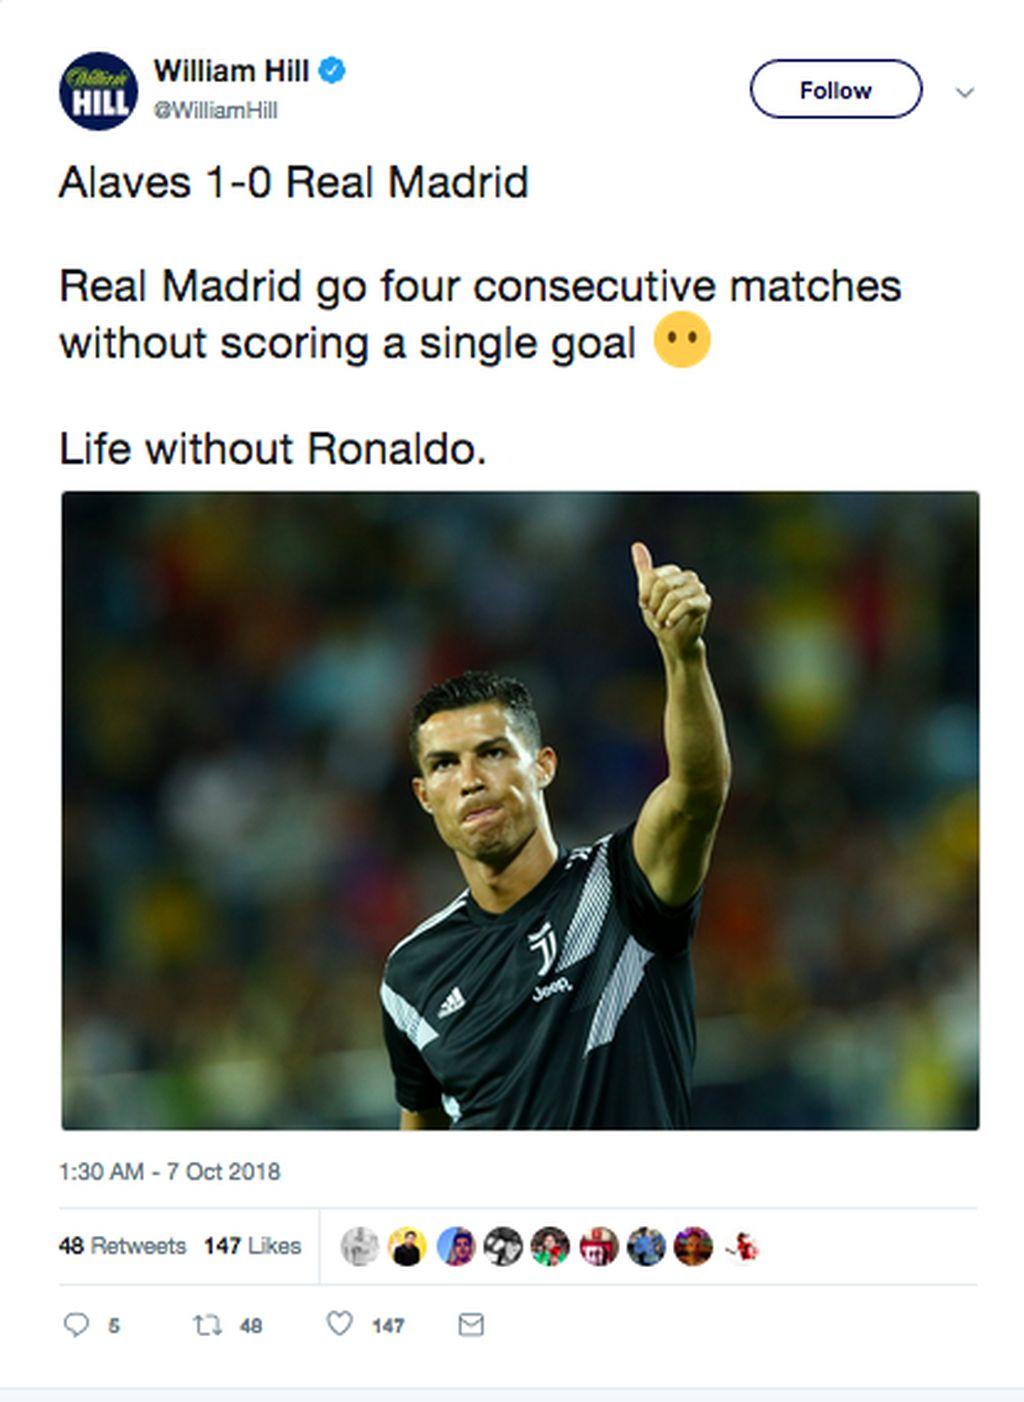 Real Madrid baru saja menela kekalahan 0-1 atas Alaves, membuat El Real tanpa kemenangan seraya tak kuasa bikin gol di empat laga terakhir. Inilah salah satu momen kehidupan Madrid selepas ditinggal Ronaldo. (Foto: Internet/Twitter)